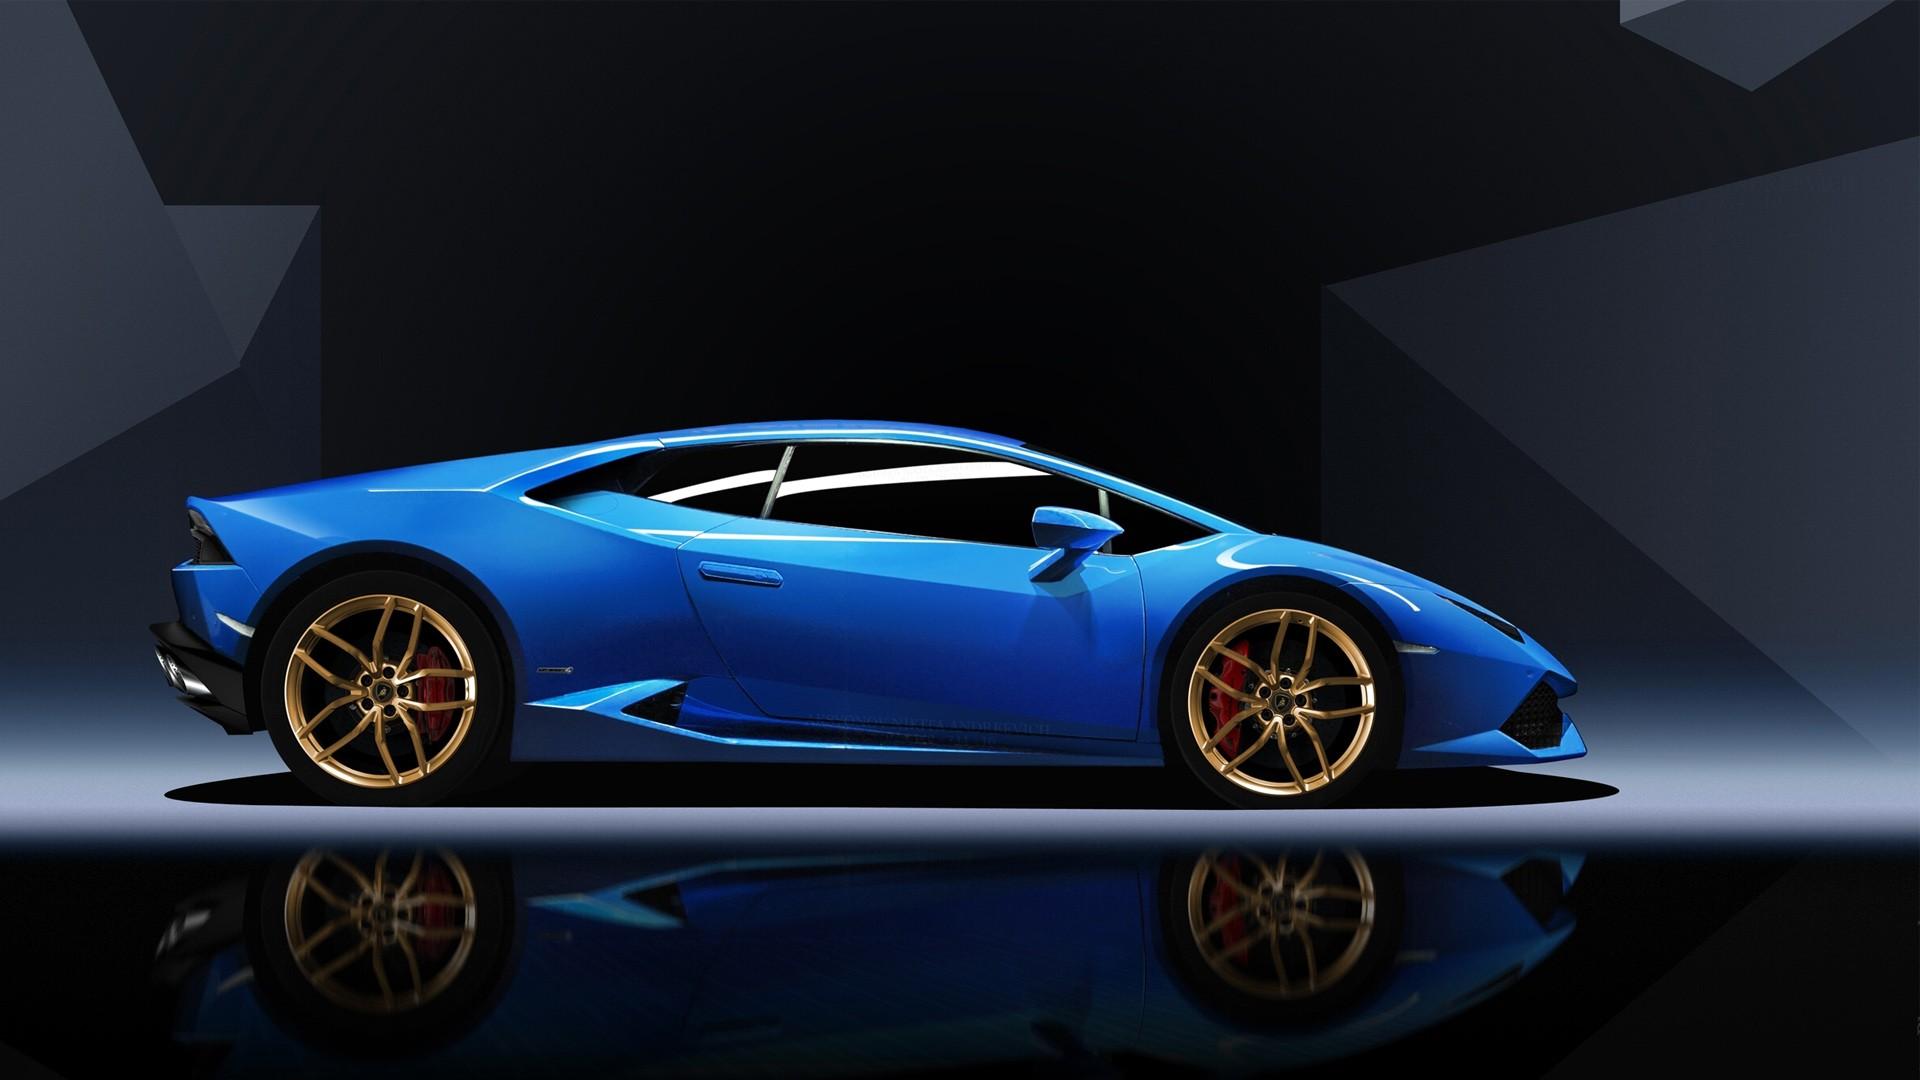 Sports Car Wallpaper Lamborghini 3d Blue Lamborghini Huracan Wallpaper Hd Car Wallpapers